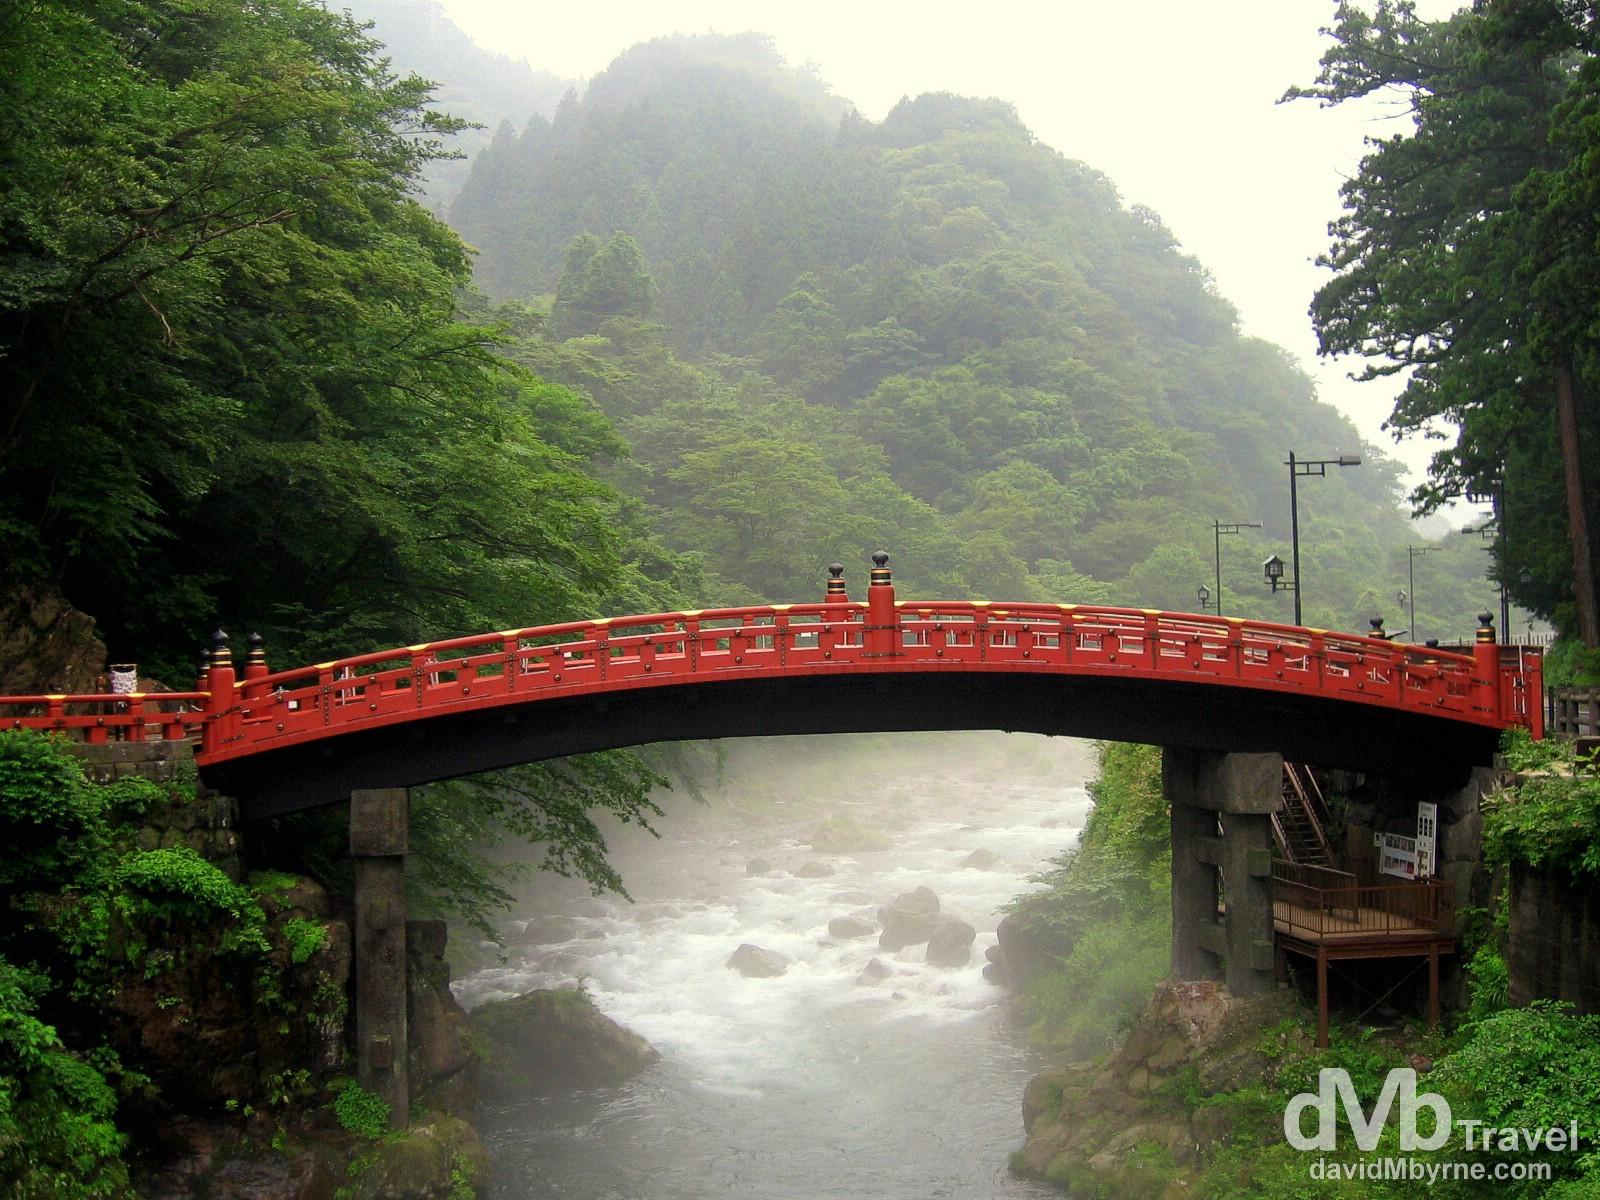 Shinkyo Bridge, Nikko, Honshu, Japan. July 16th, 2005.